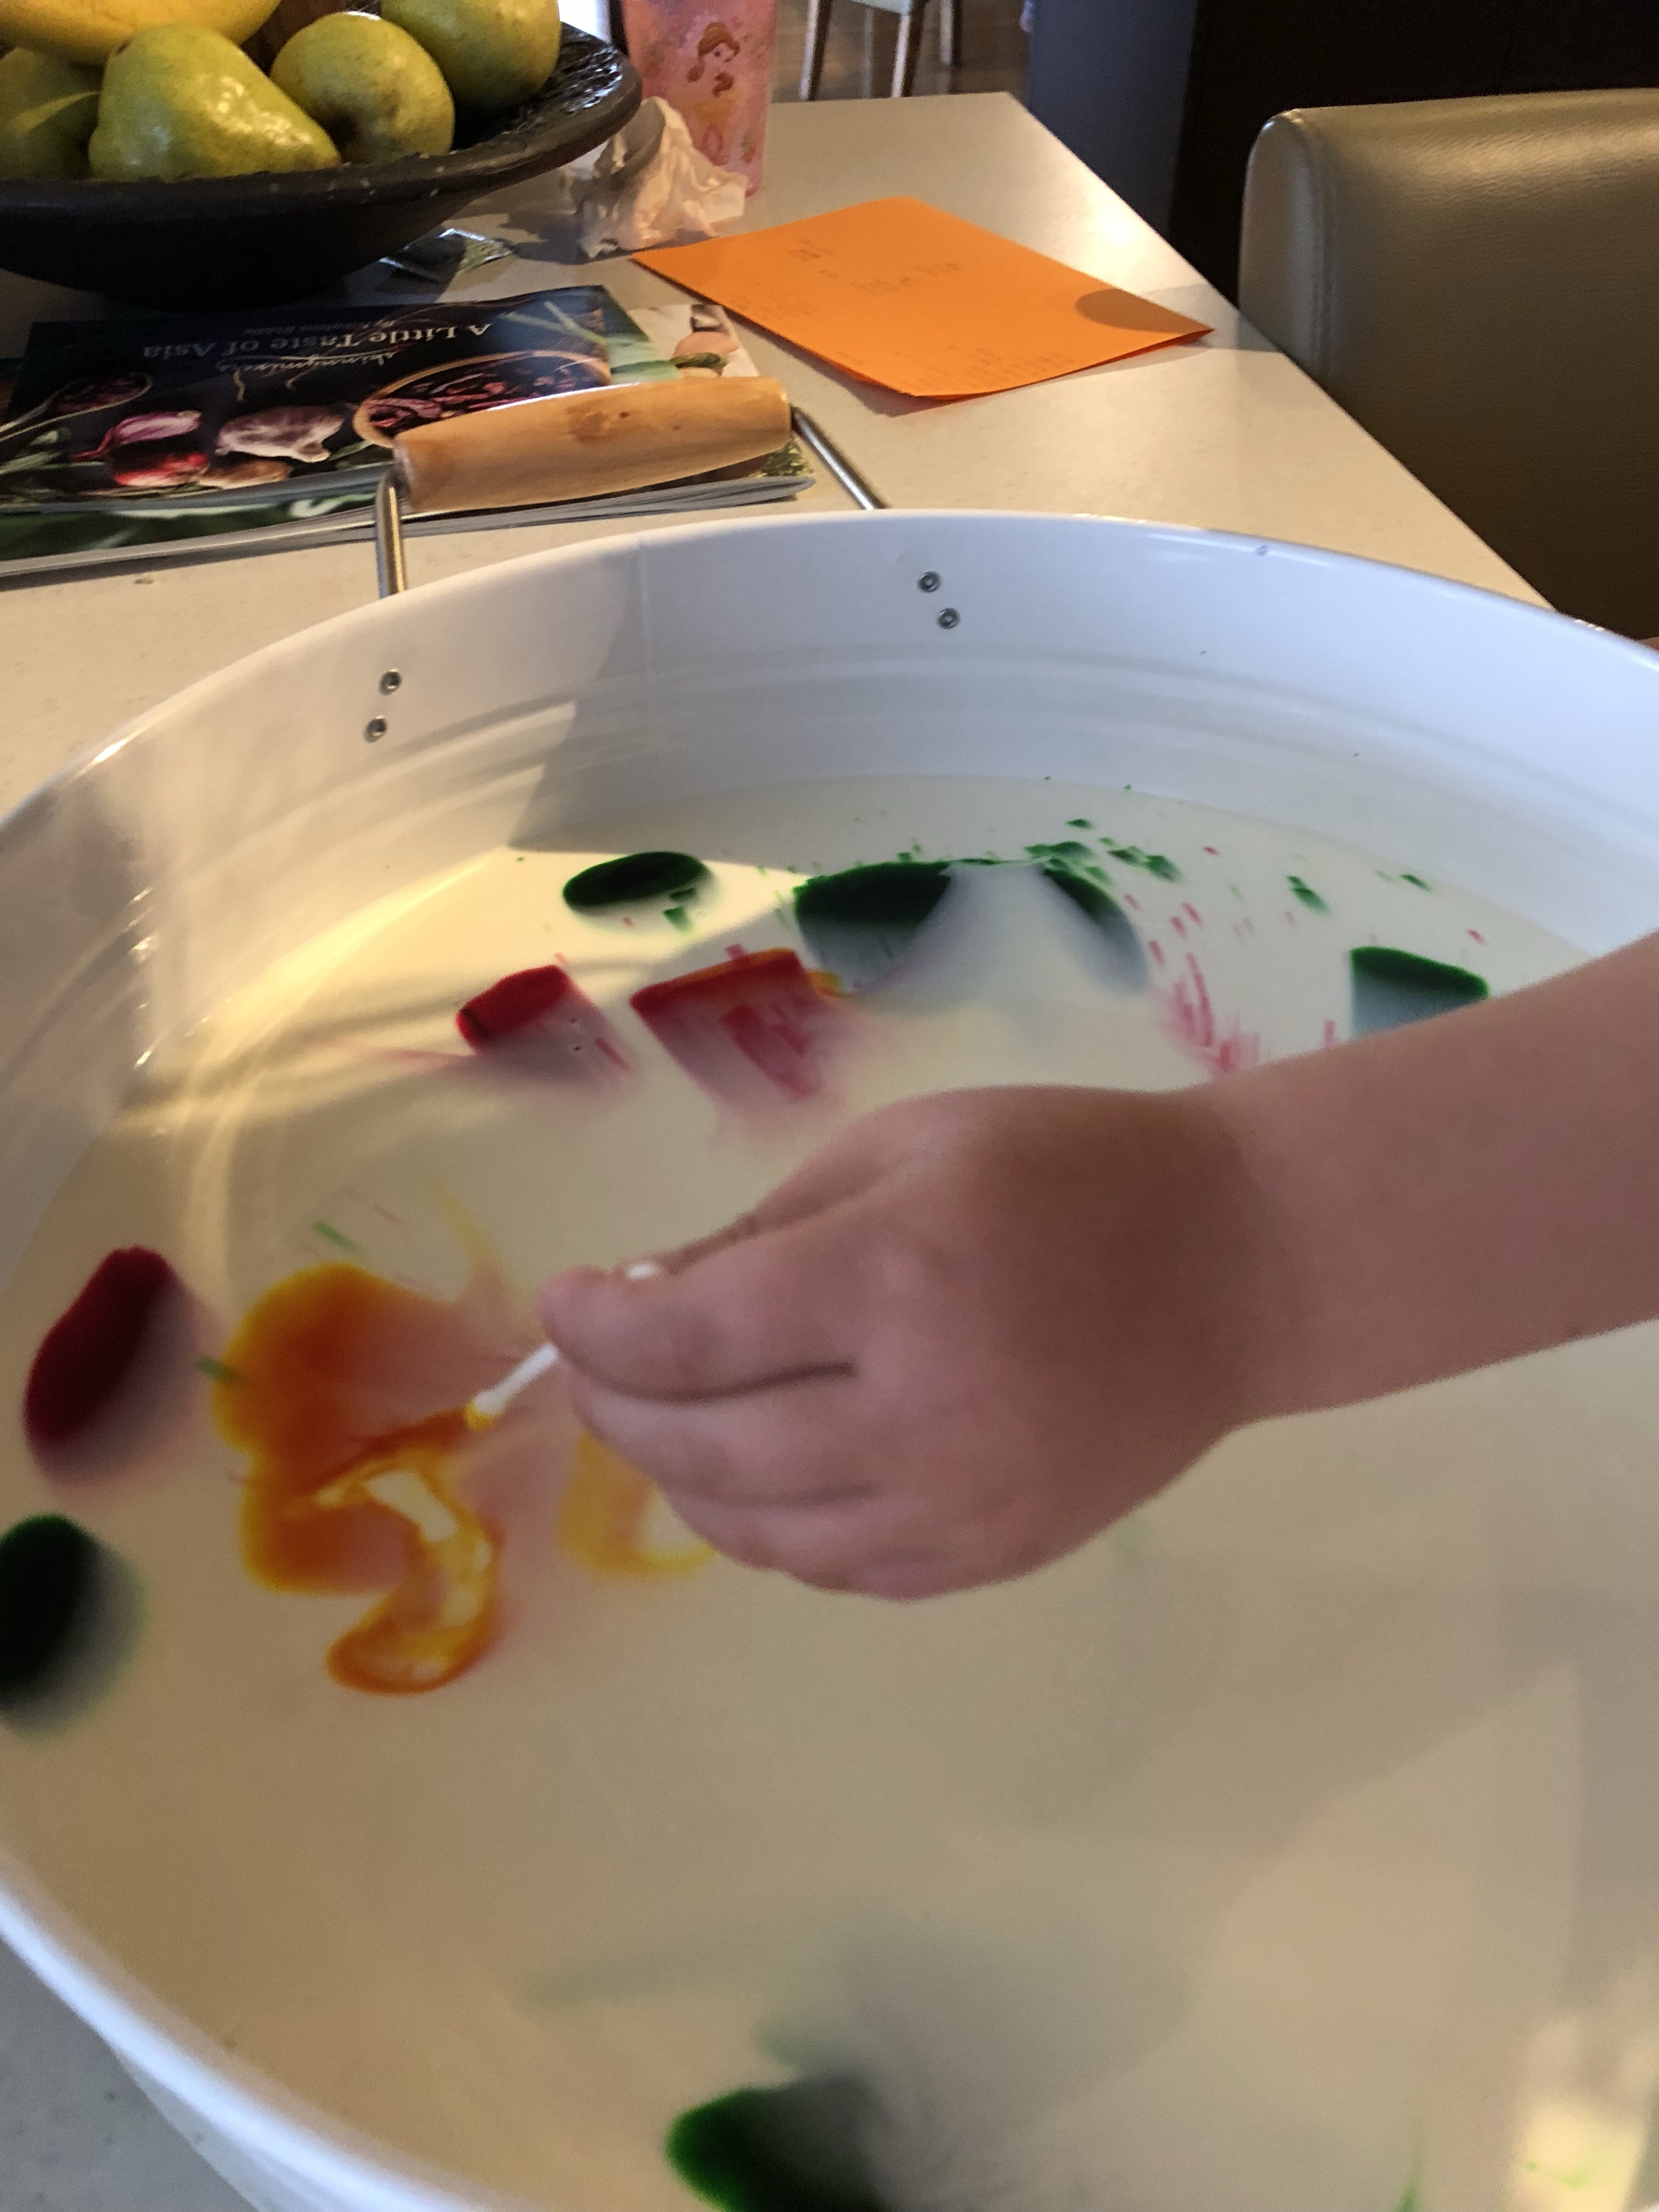 contact dishwashing liquid with milk